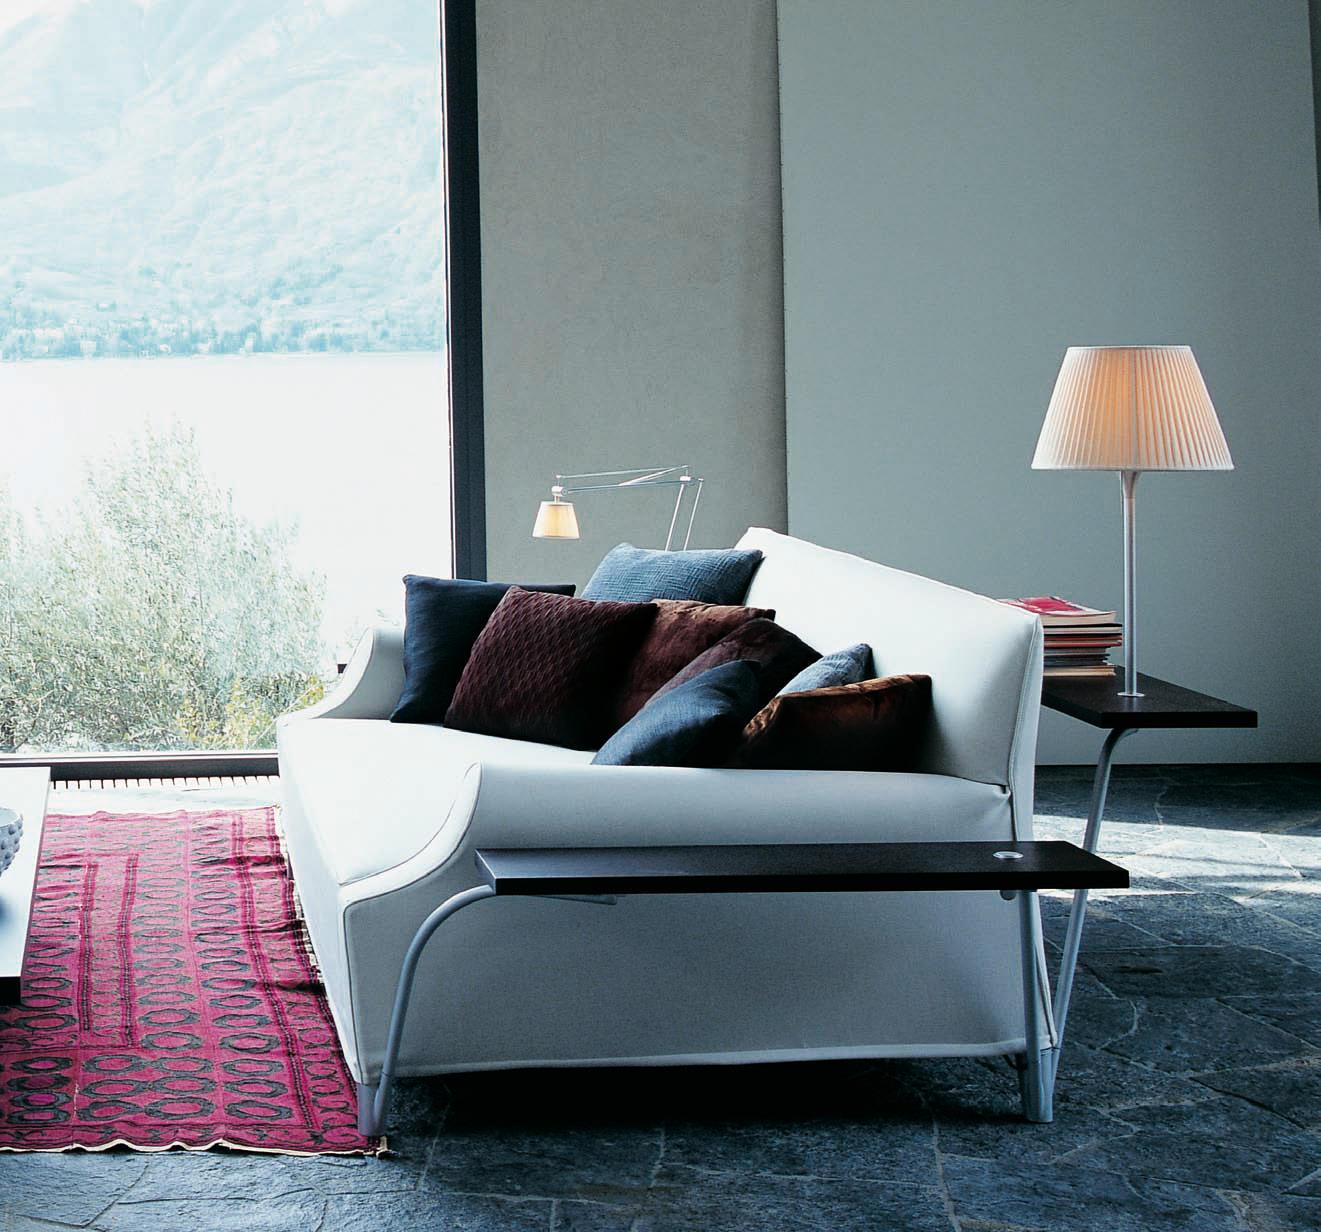 212 l w s sofas von cassina architonic. Black Bedroom Furniture Sets. Home Design Ideas